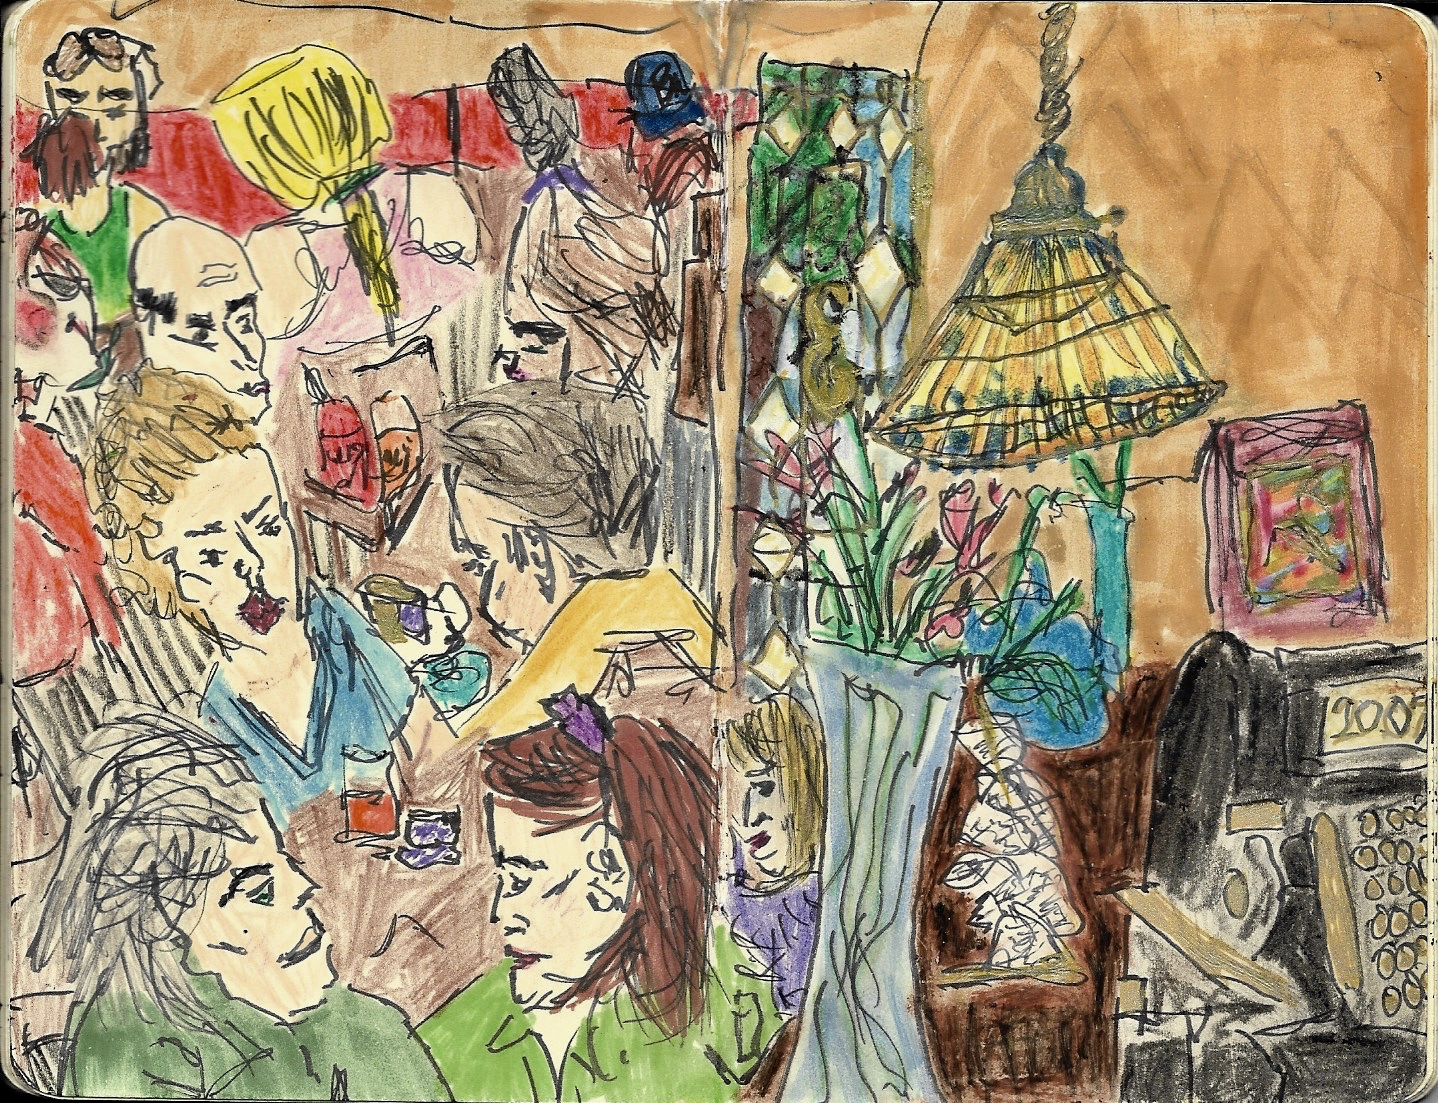 3rd Coast Café - by Marianne Maili